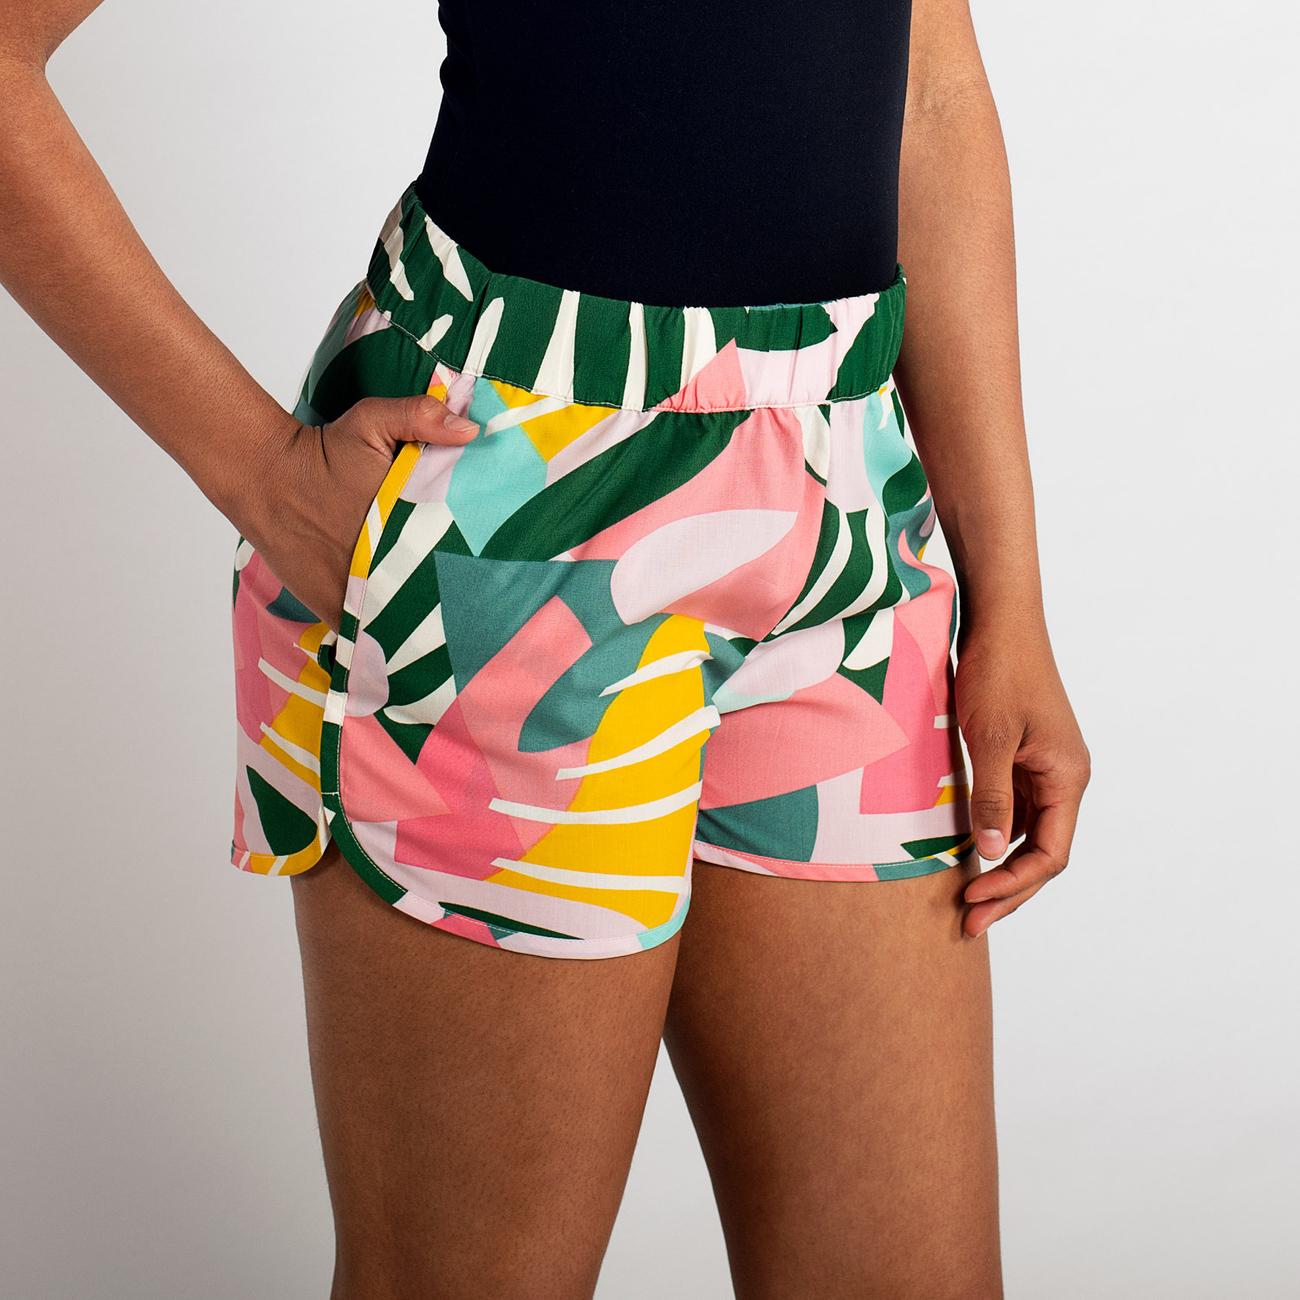 Shorts Sandvika Collage Leaves